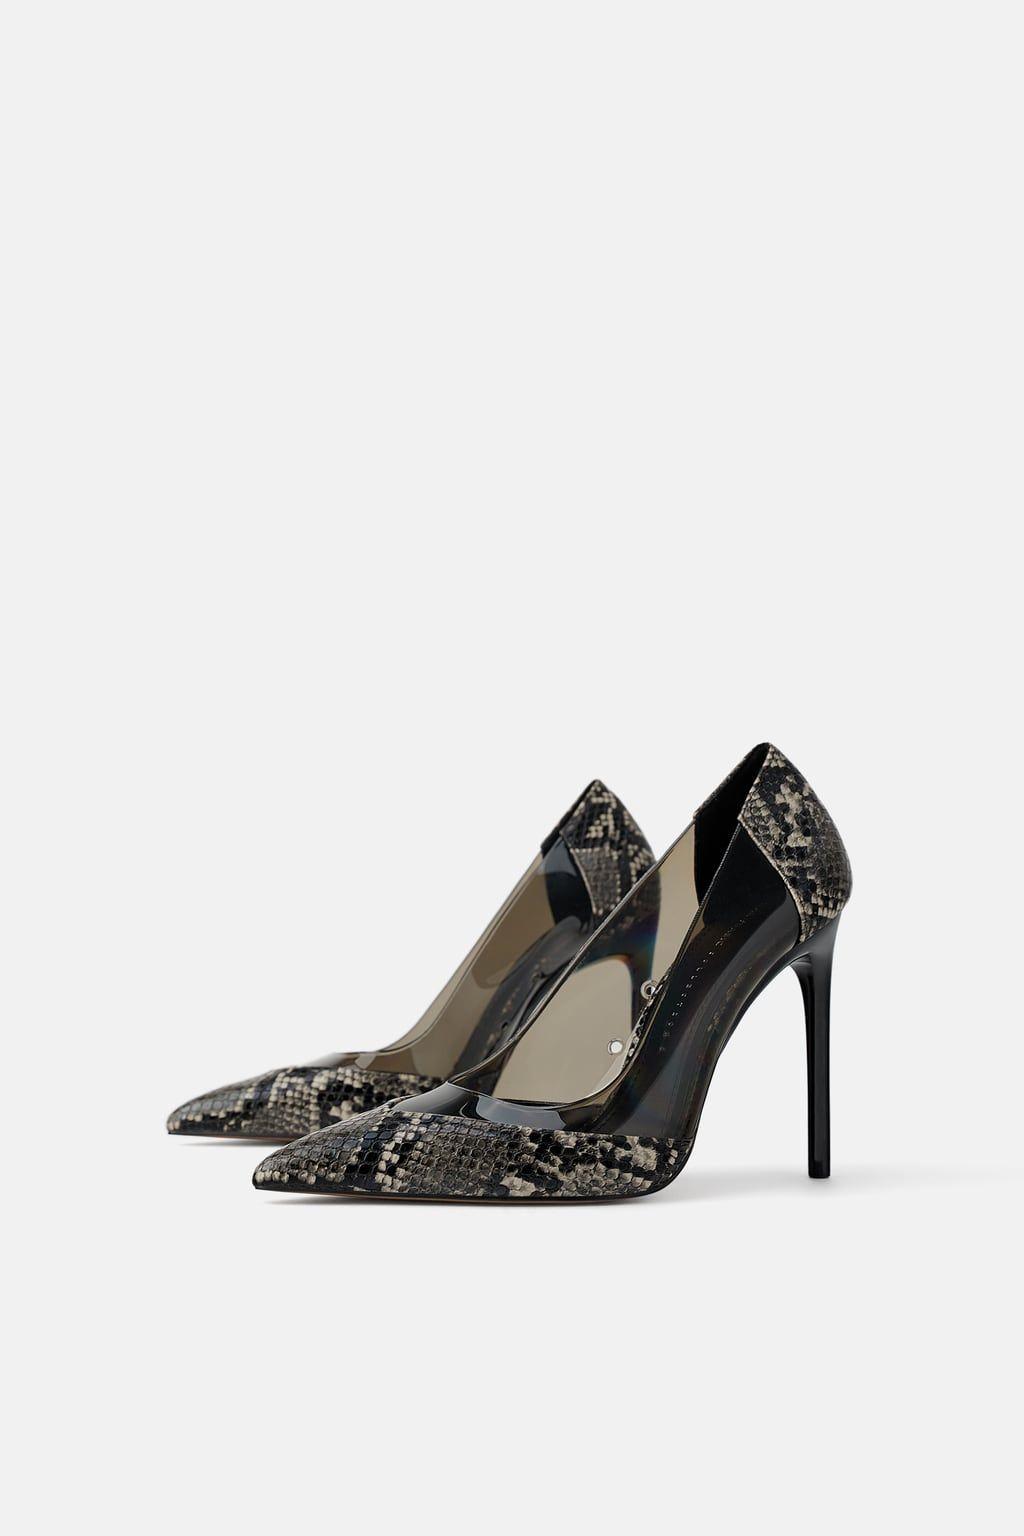 afc9671e862 Zara Picks — 10 Pieces under $100 to Wear Now — Budget Fashionista ...